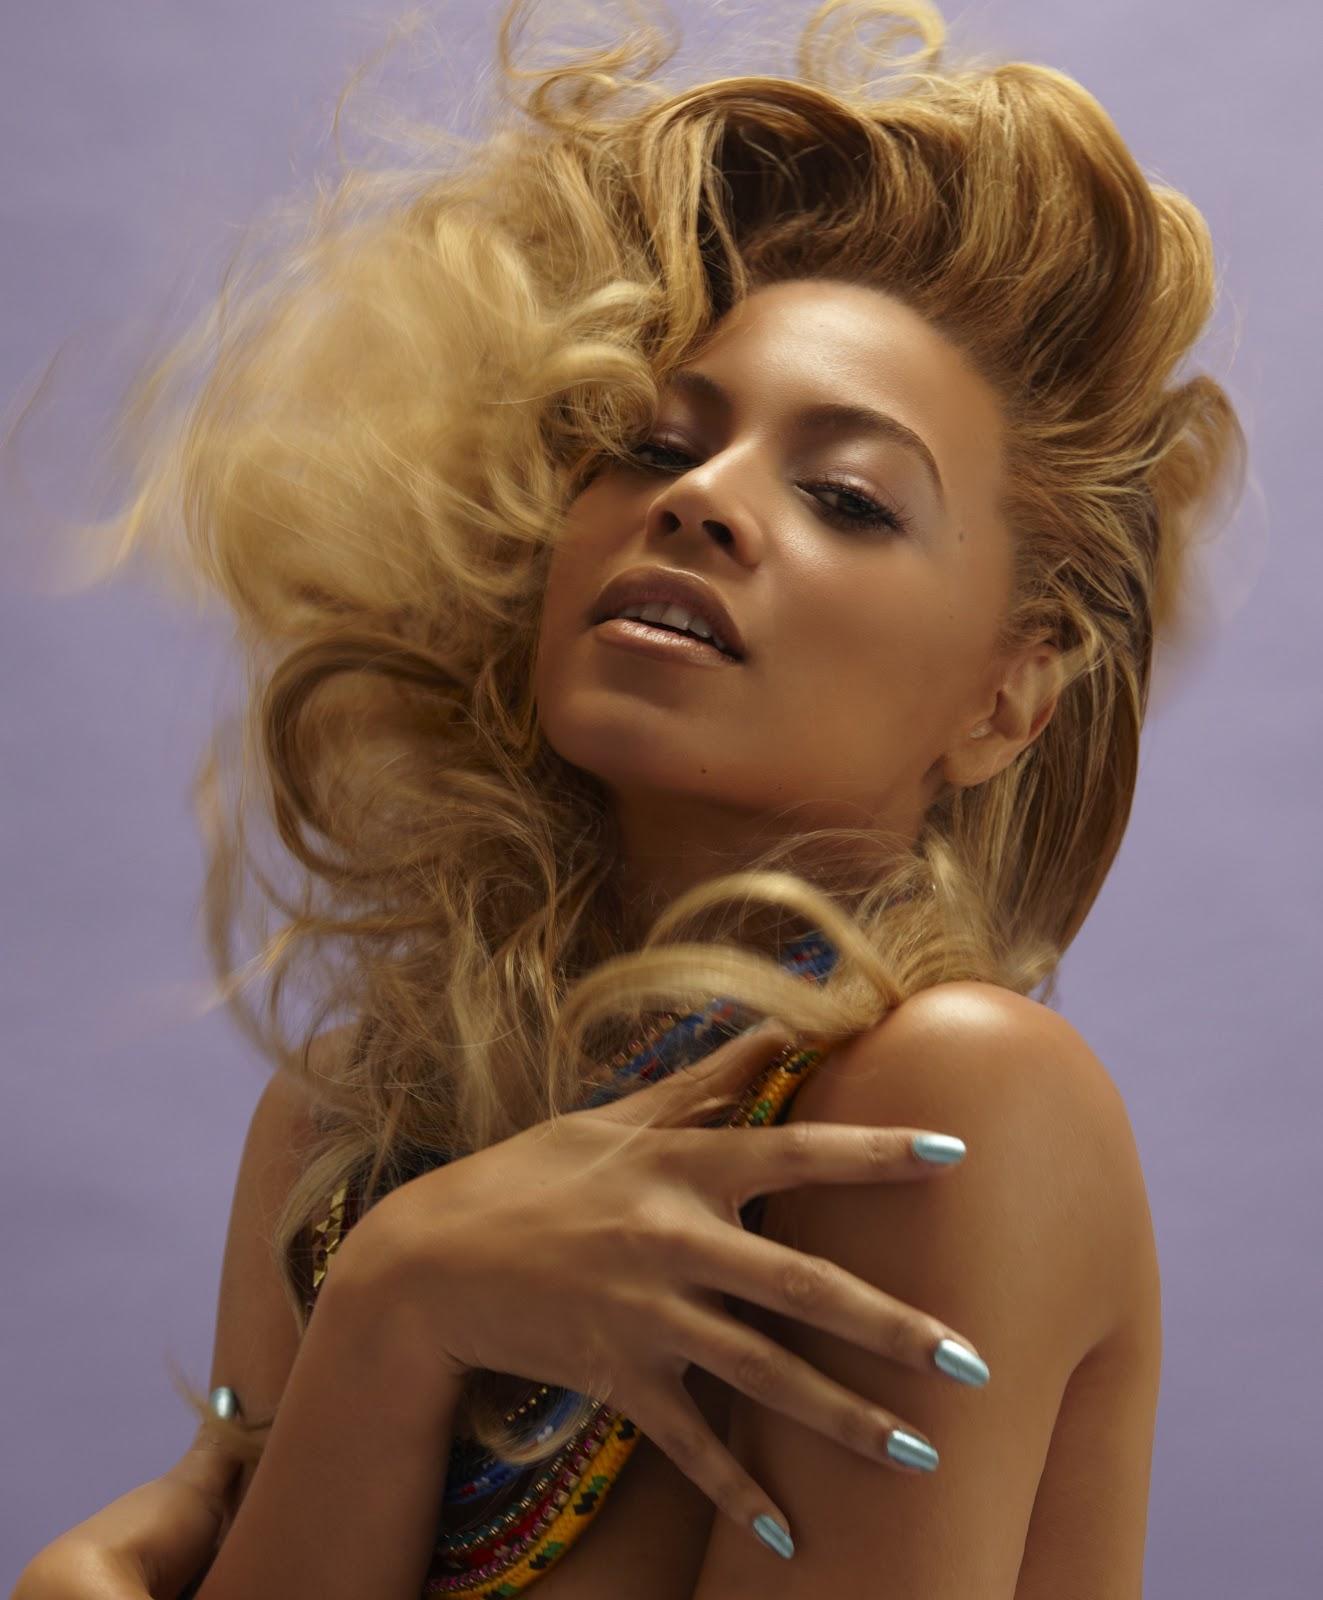 http://2.bp.blogspot.com/-BhbjojfWUoE/T-7-Ekr6x1I/AAAAAAAAESo/ySI9UFfRUqk/s1600/Beyonce_Knowles_with_necklaces.jpg